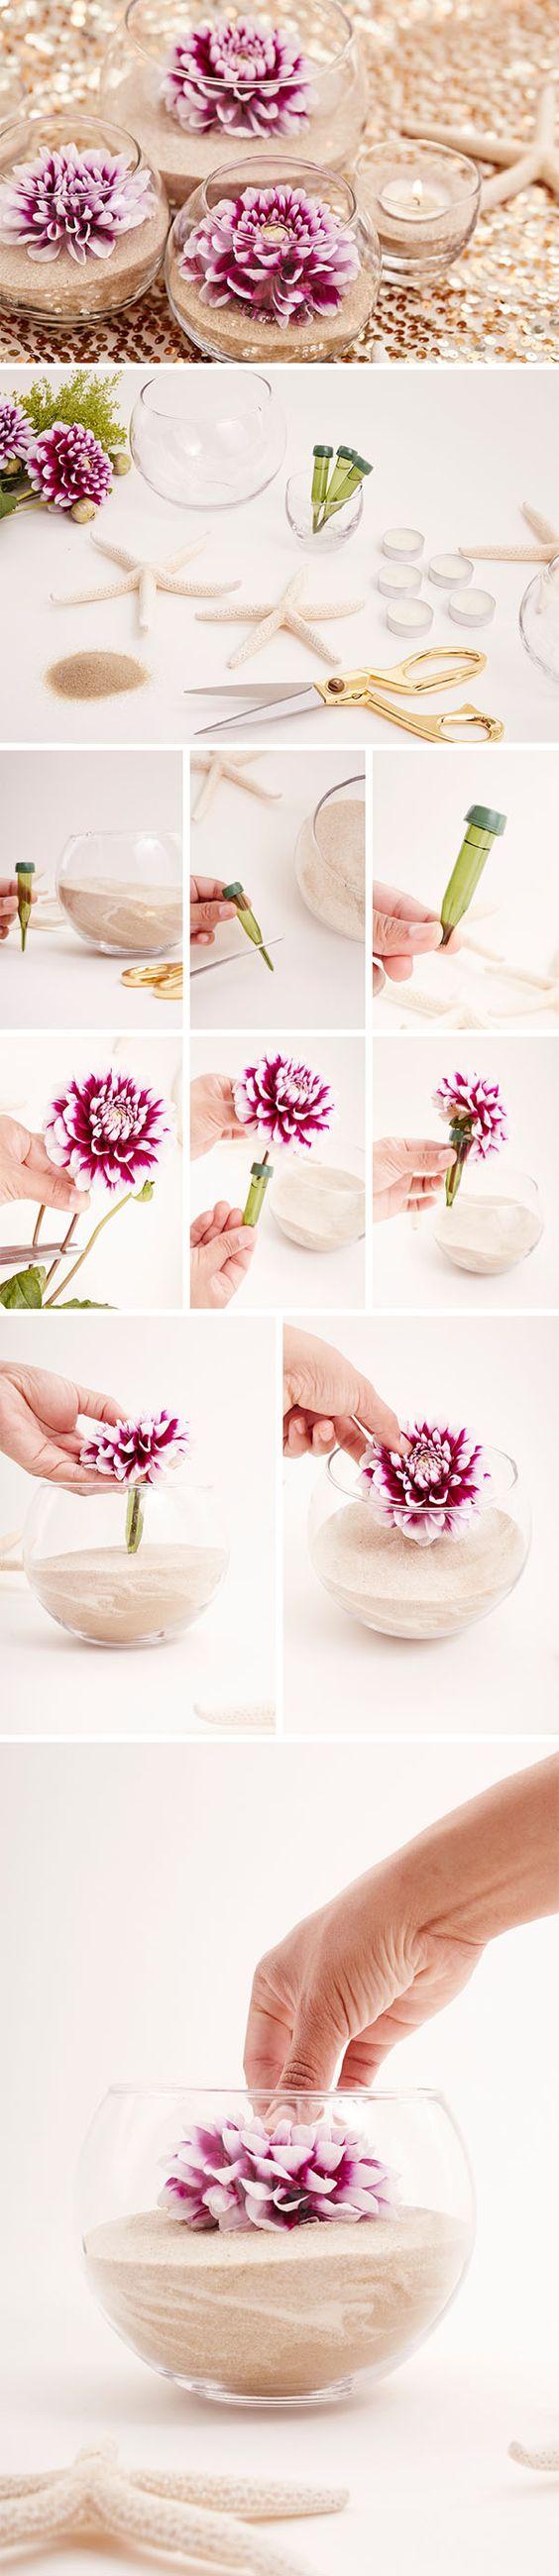 Blume& Seestern